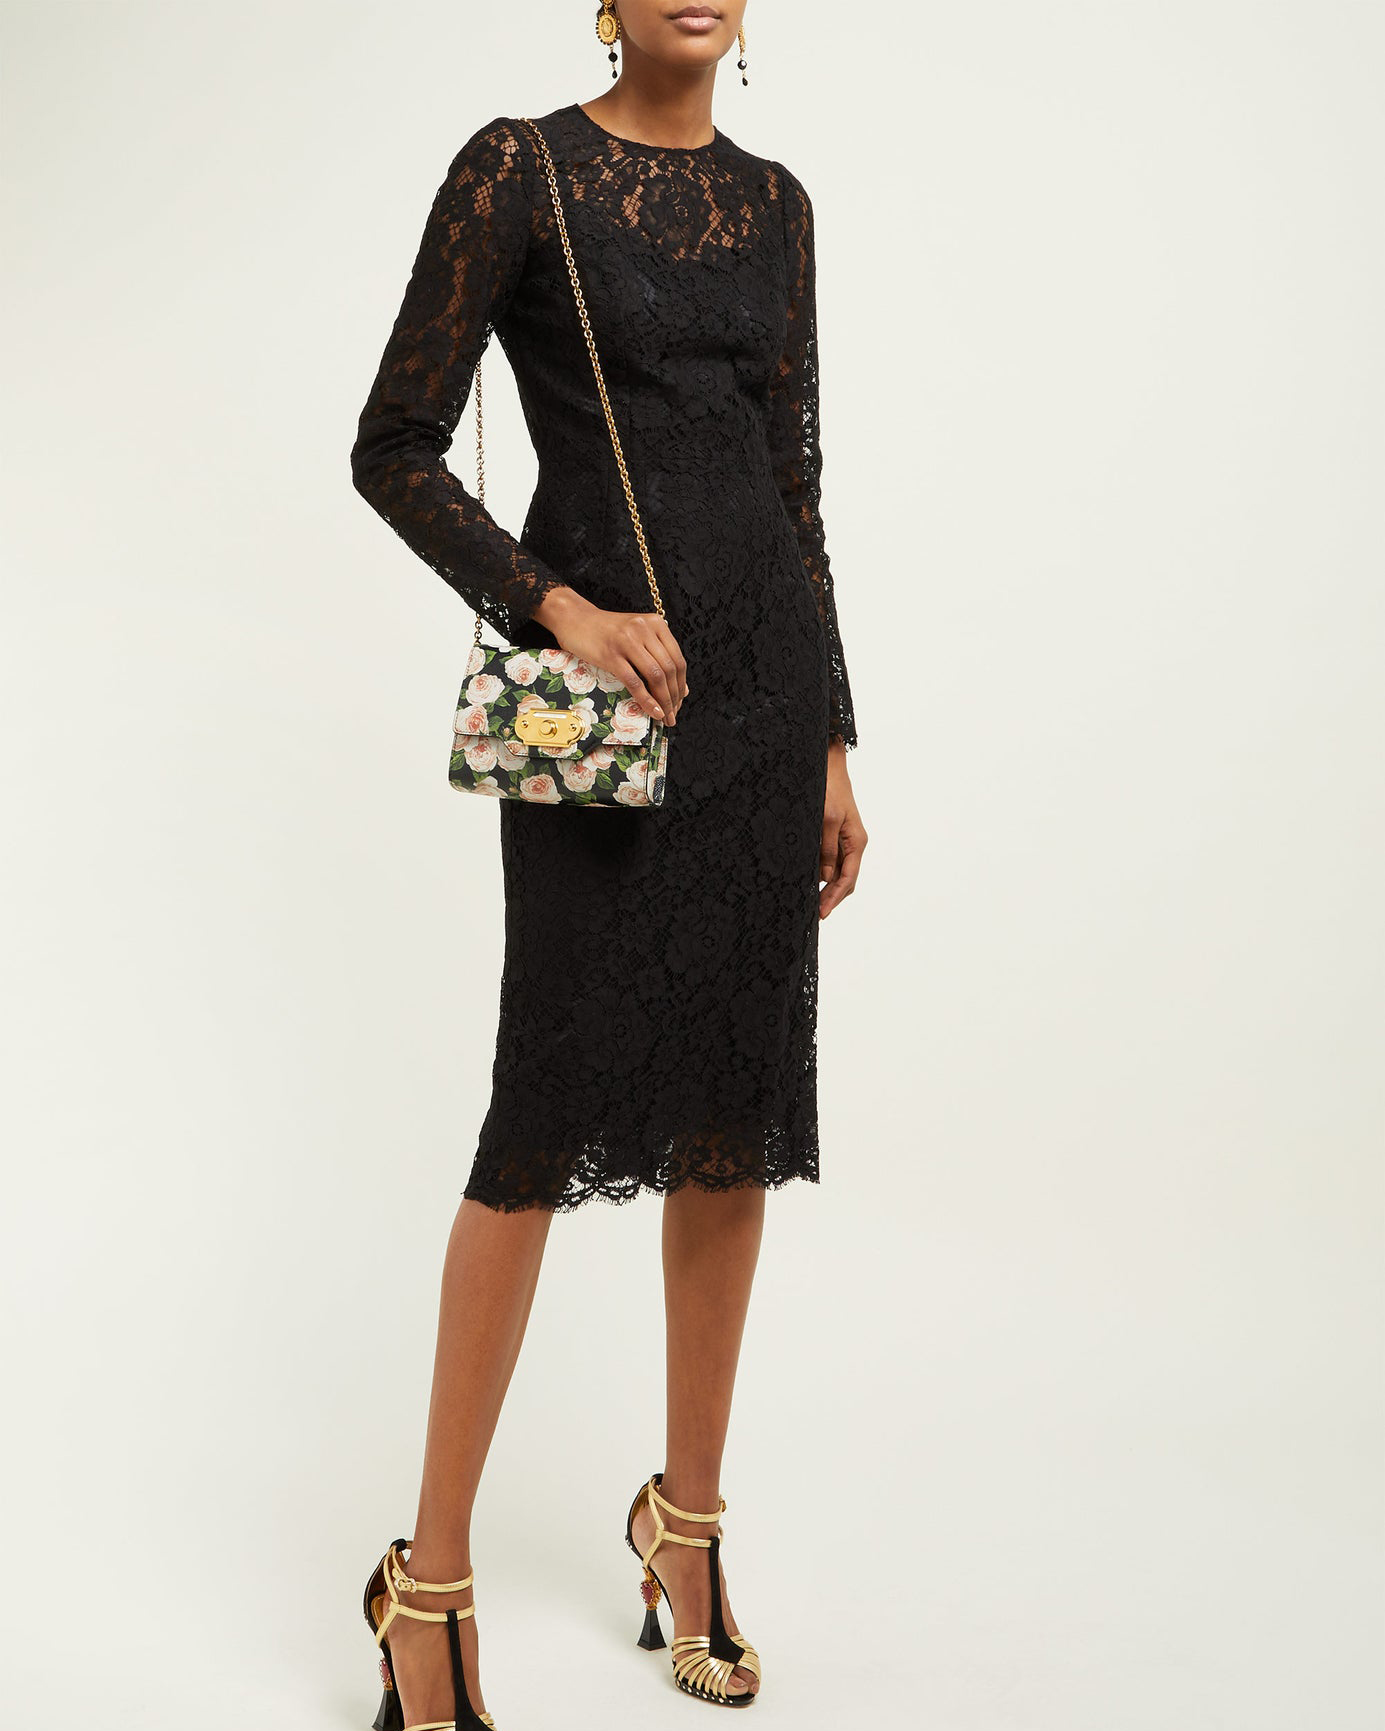 Dolce & Gabbana Floral and Eyelash Lace Midi Dress